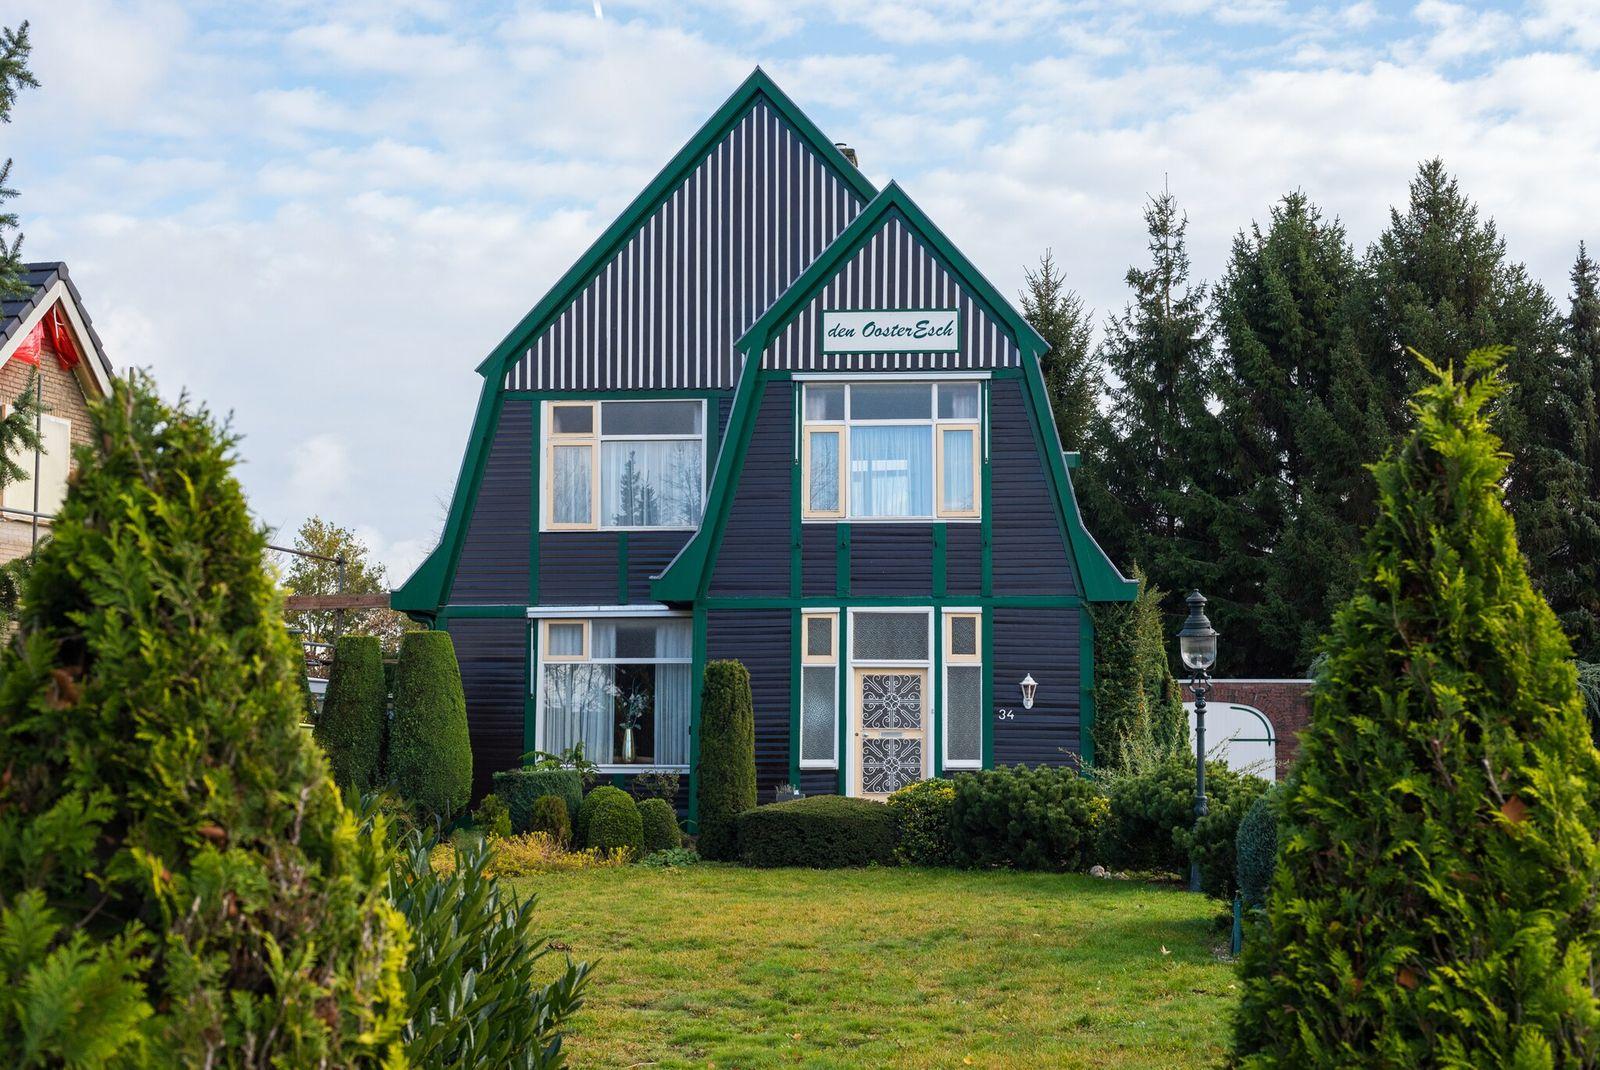 Eibergseweg 34, Groenlo